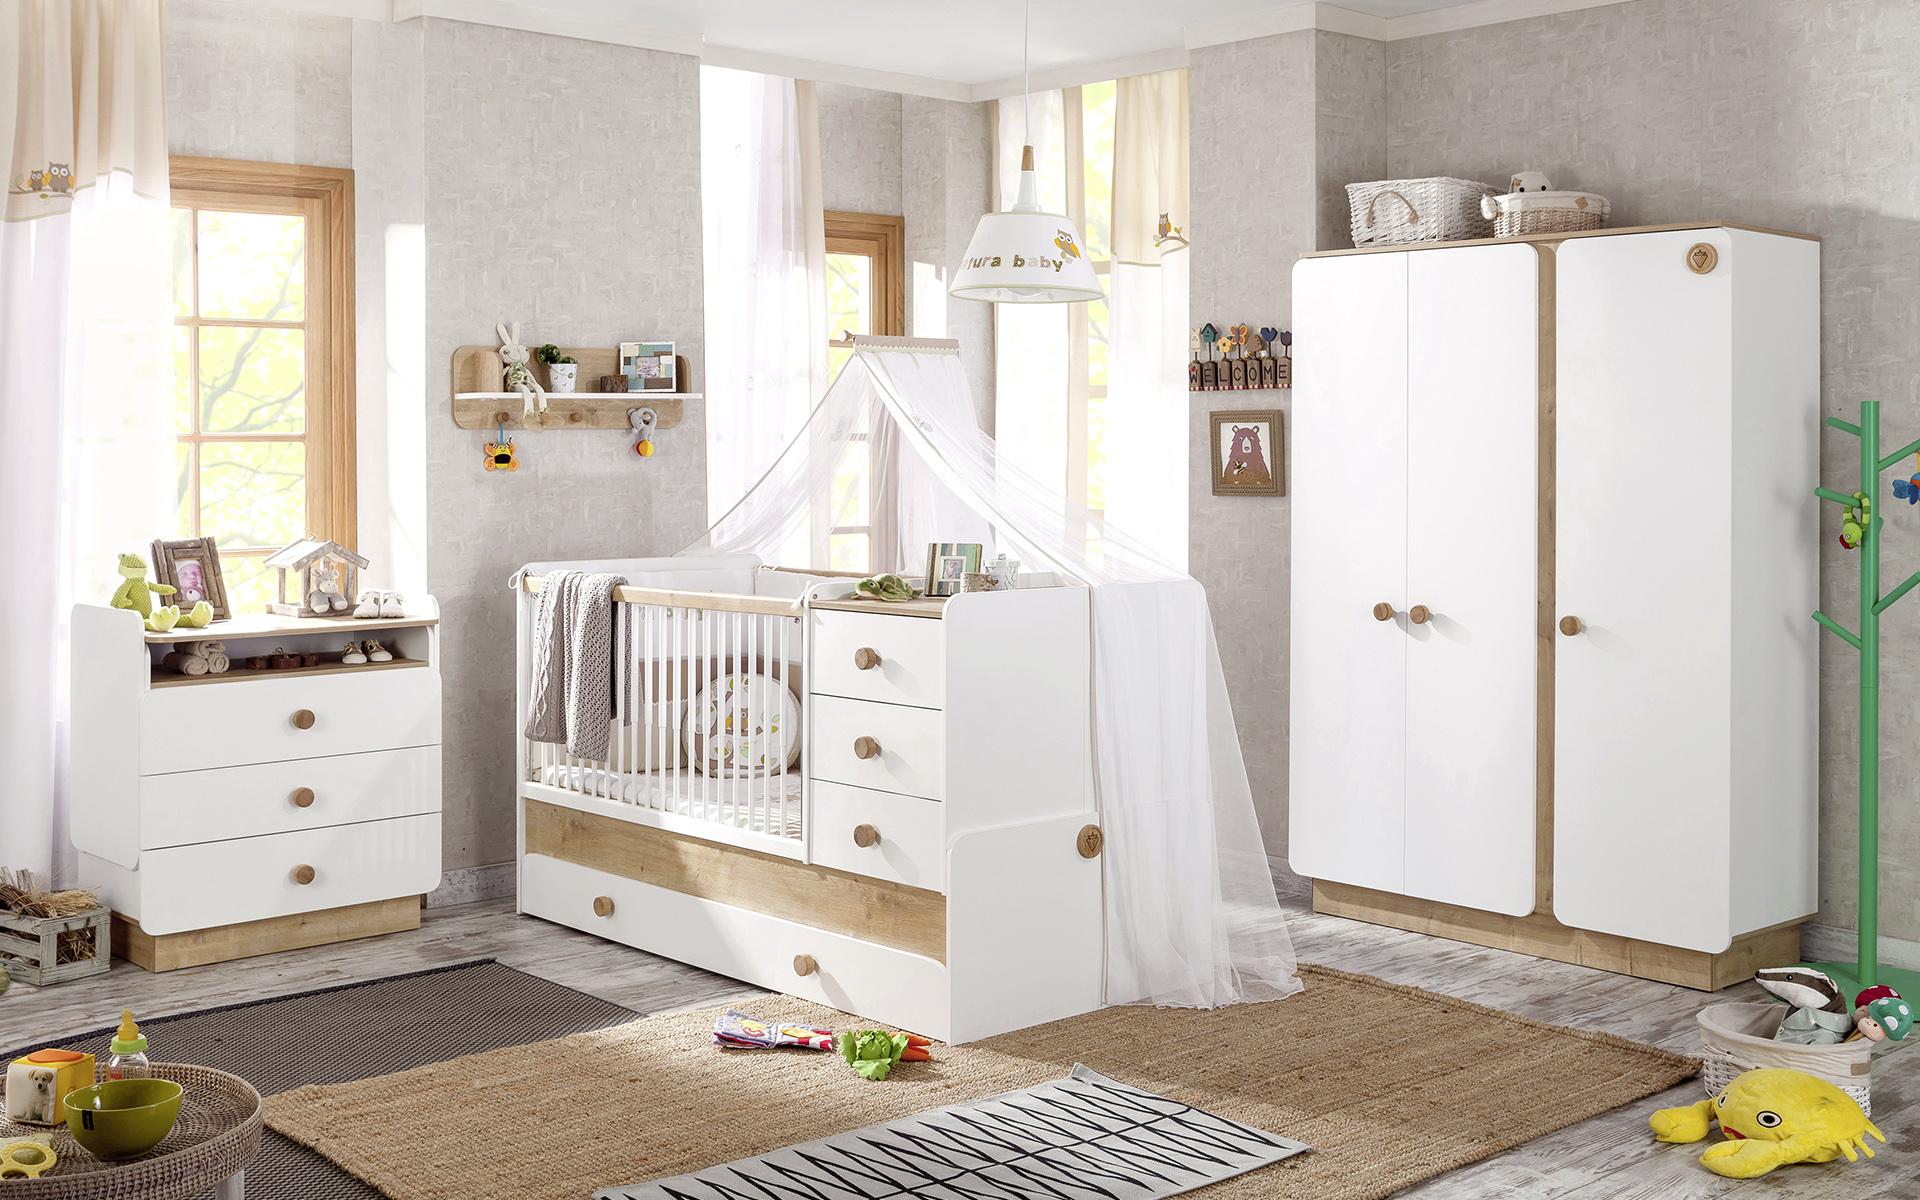 alle babykamers - babykamer specialist in kinderkamers en slaapkamers, Deco ideeën